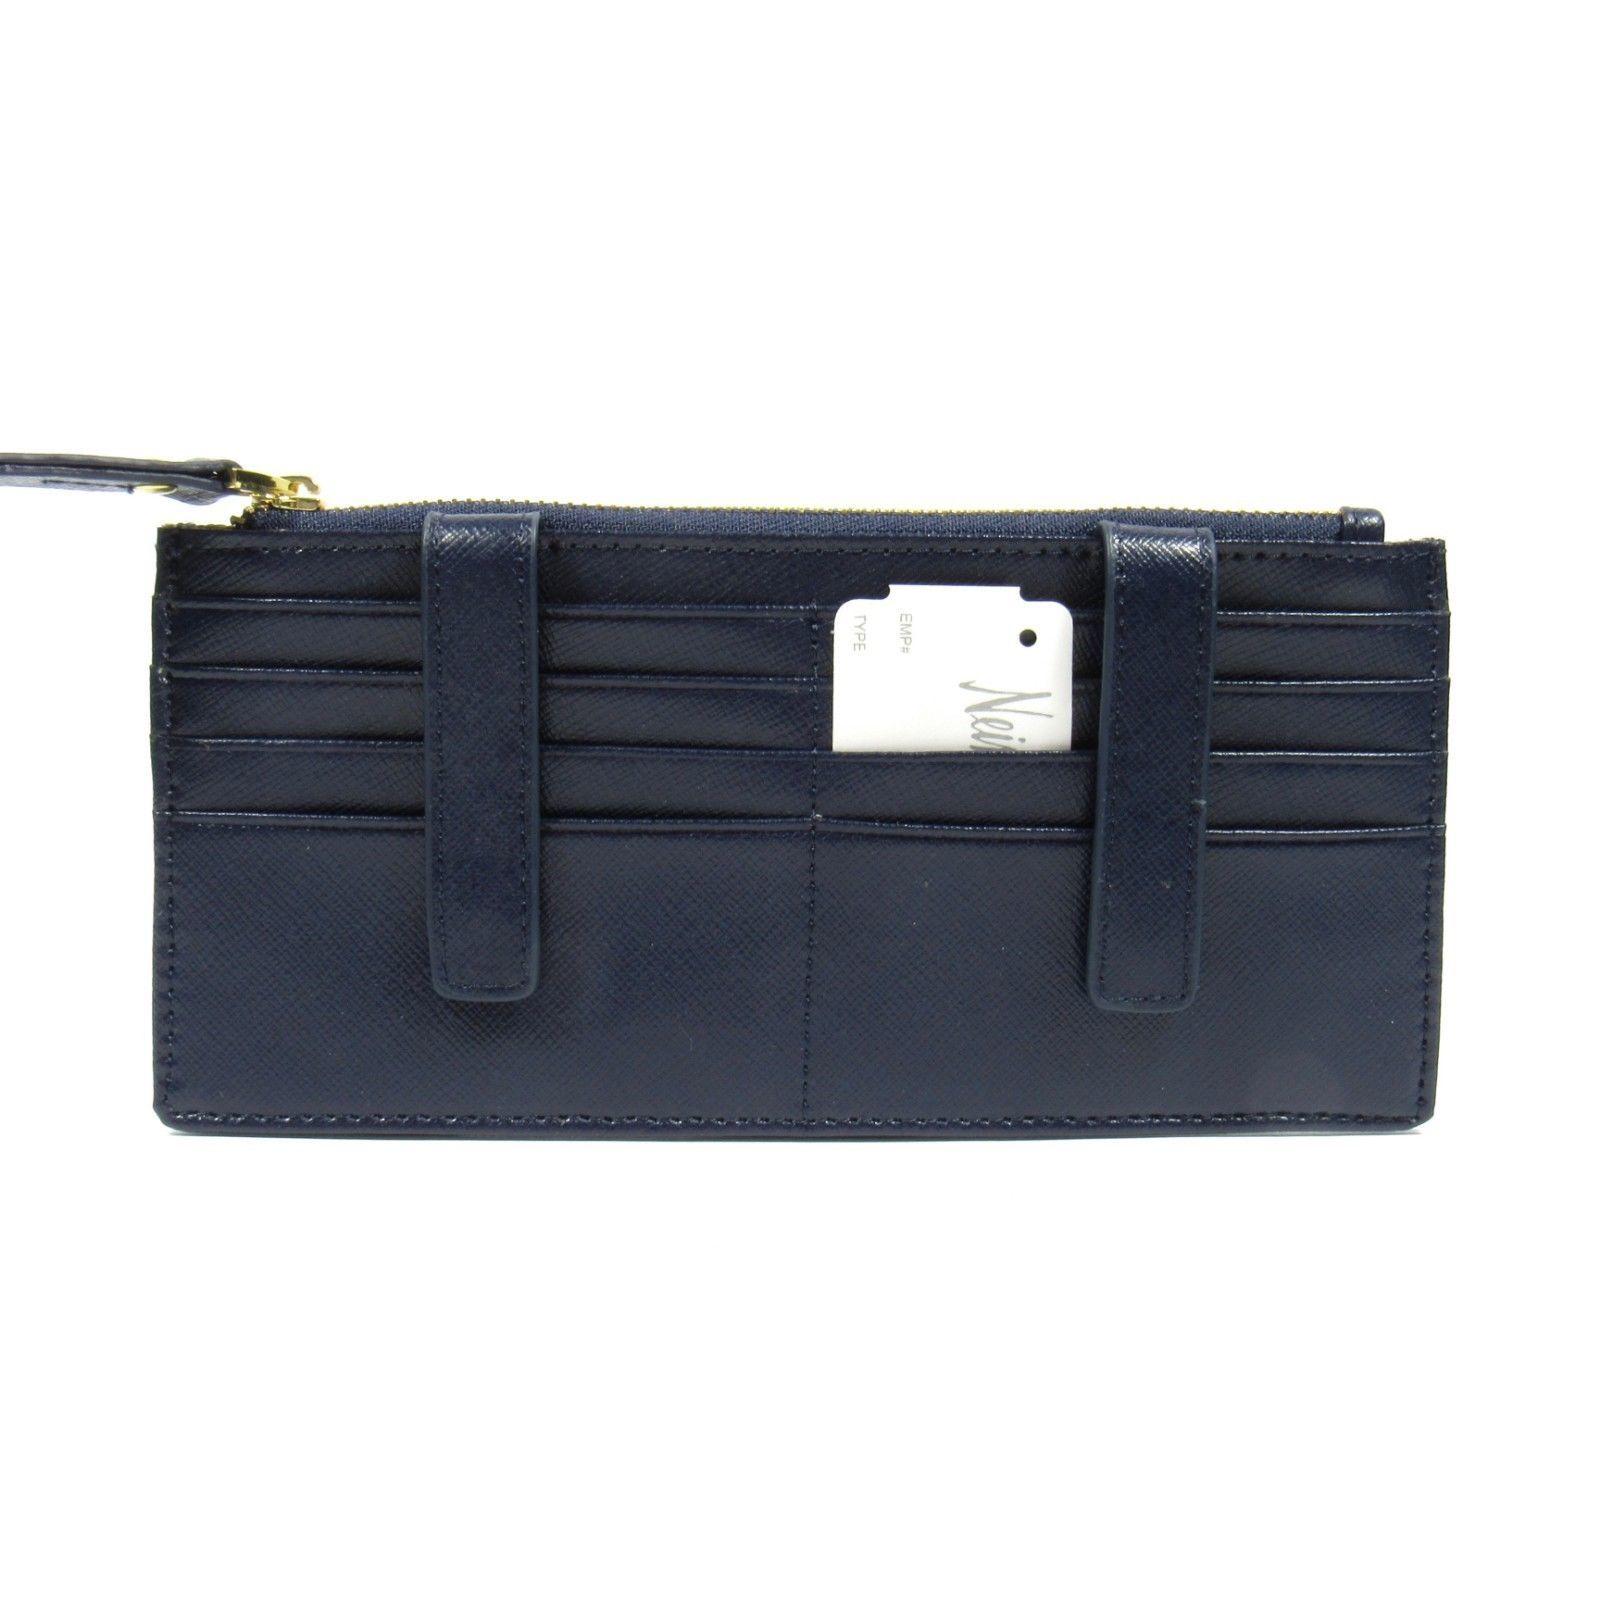 Neiman Marcus Women's ID Wallet Organizer Card Case.Saffiano Leather. Navy Blue